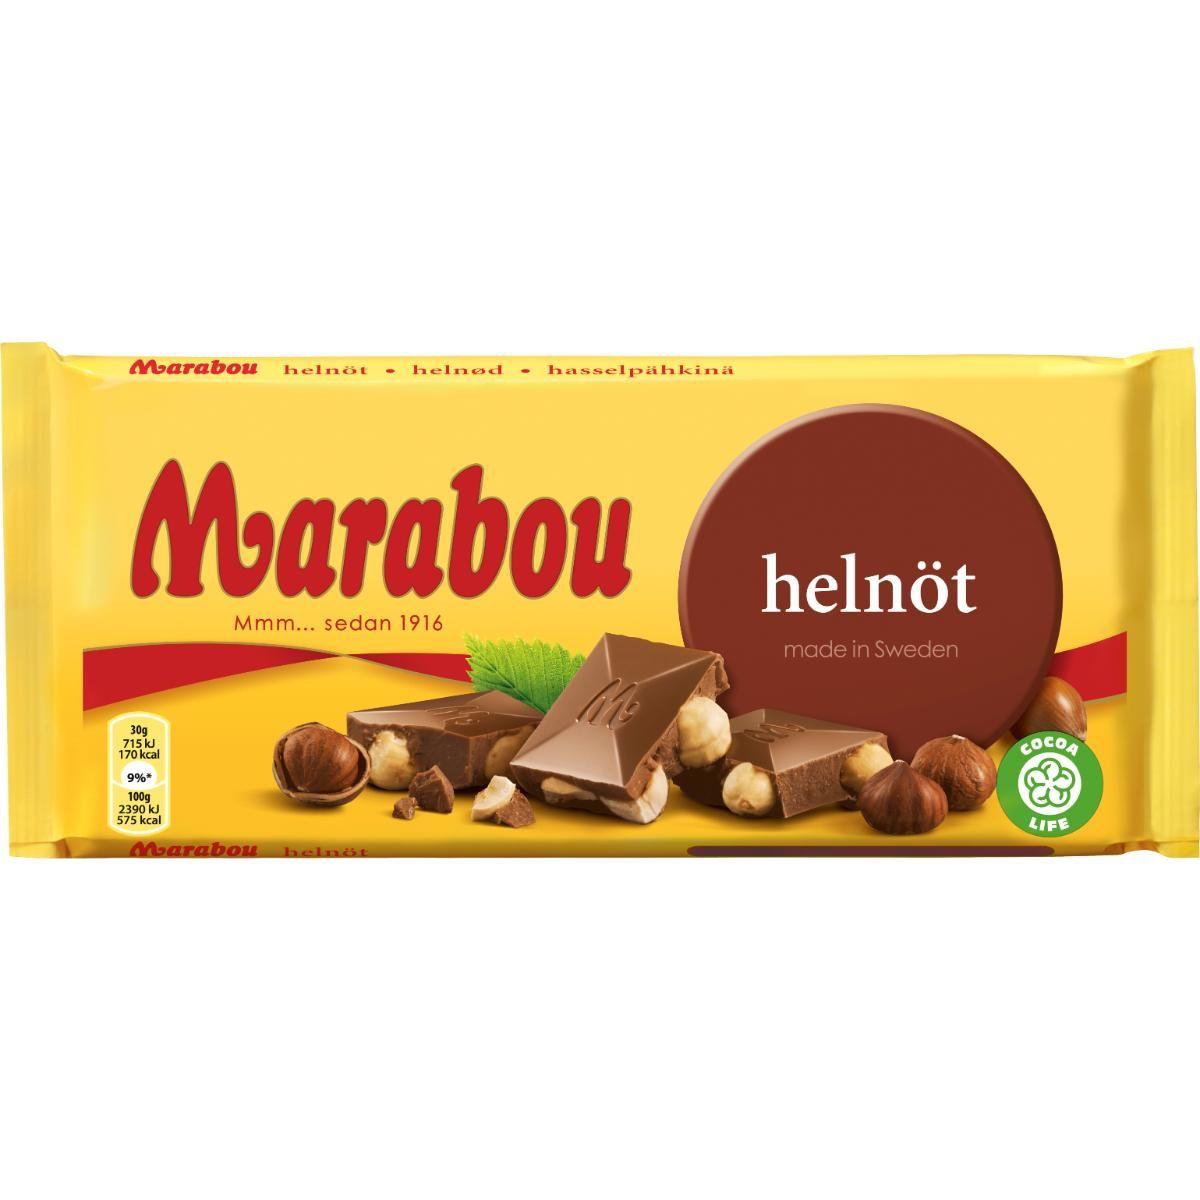 marabou 100g kcal